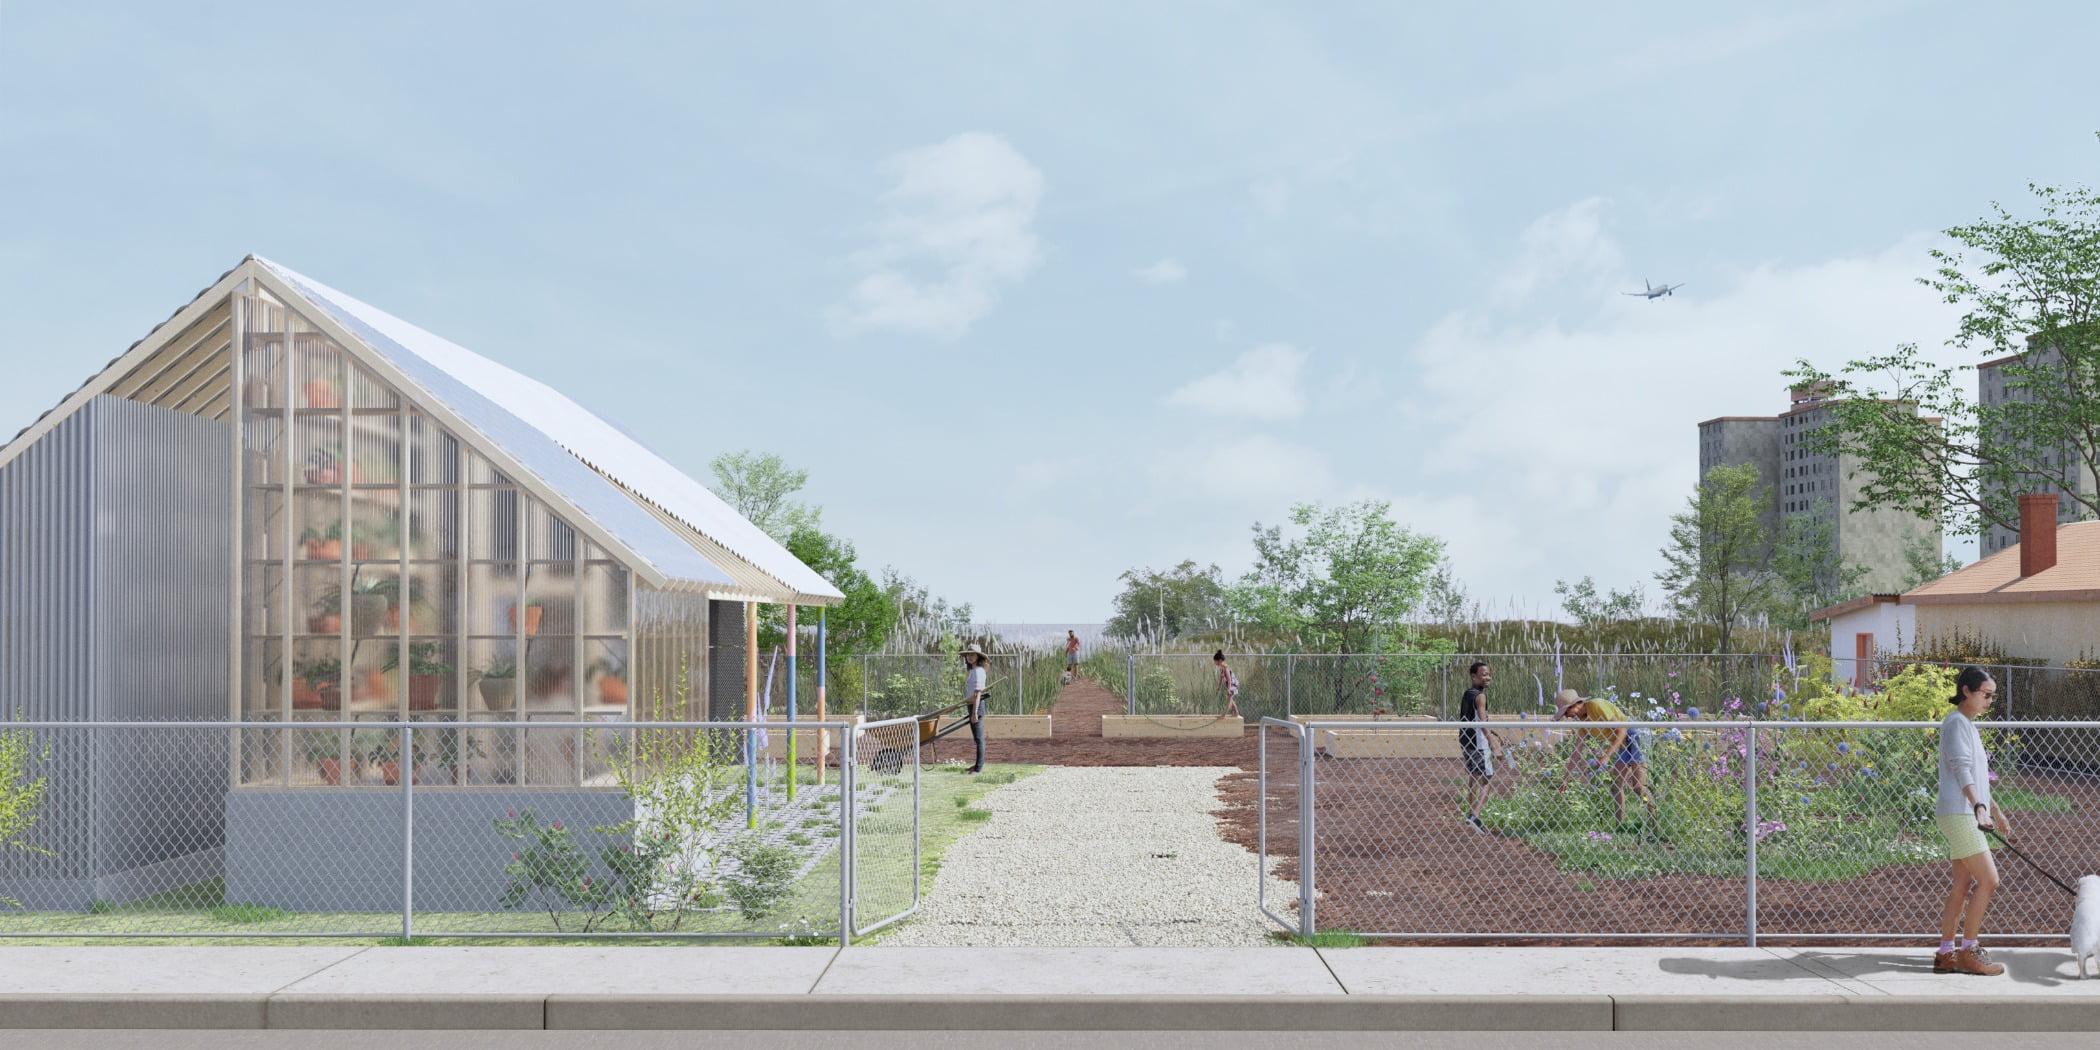 Land lot, Urban design, Road surface, Cloud, Sky, Plant, Building, Tree